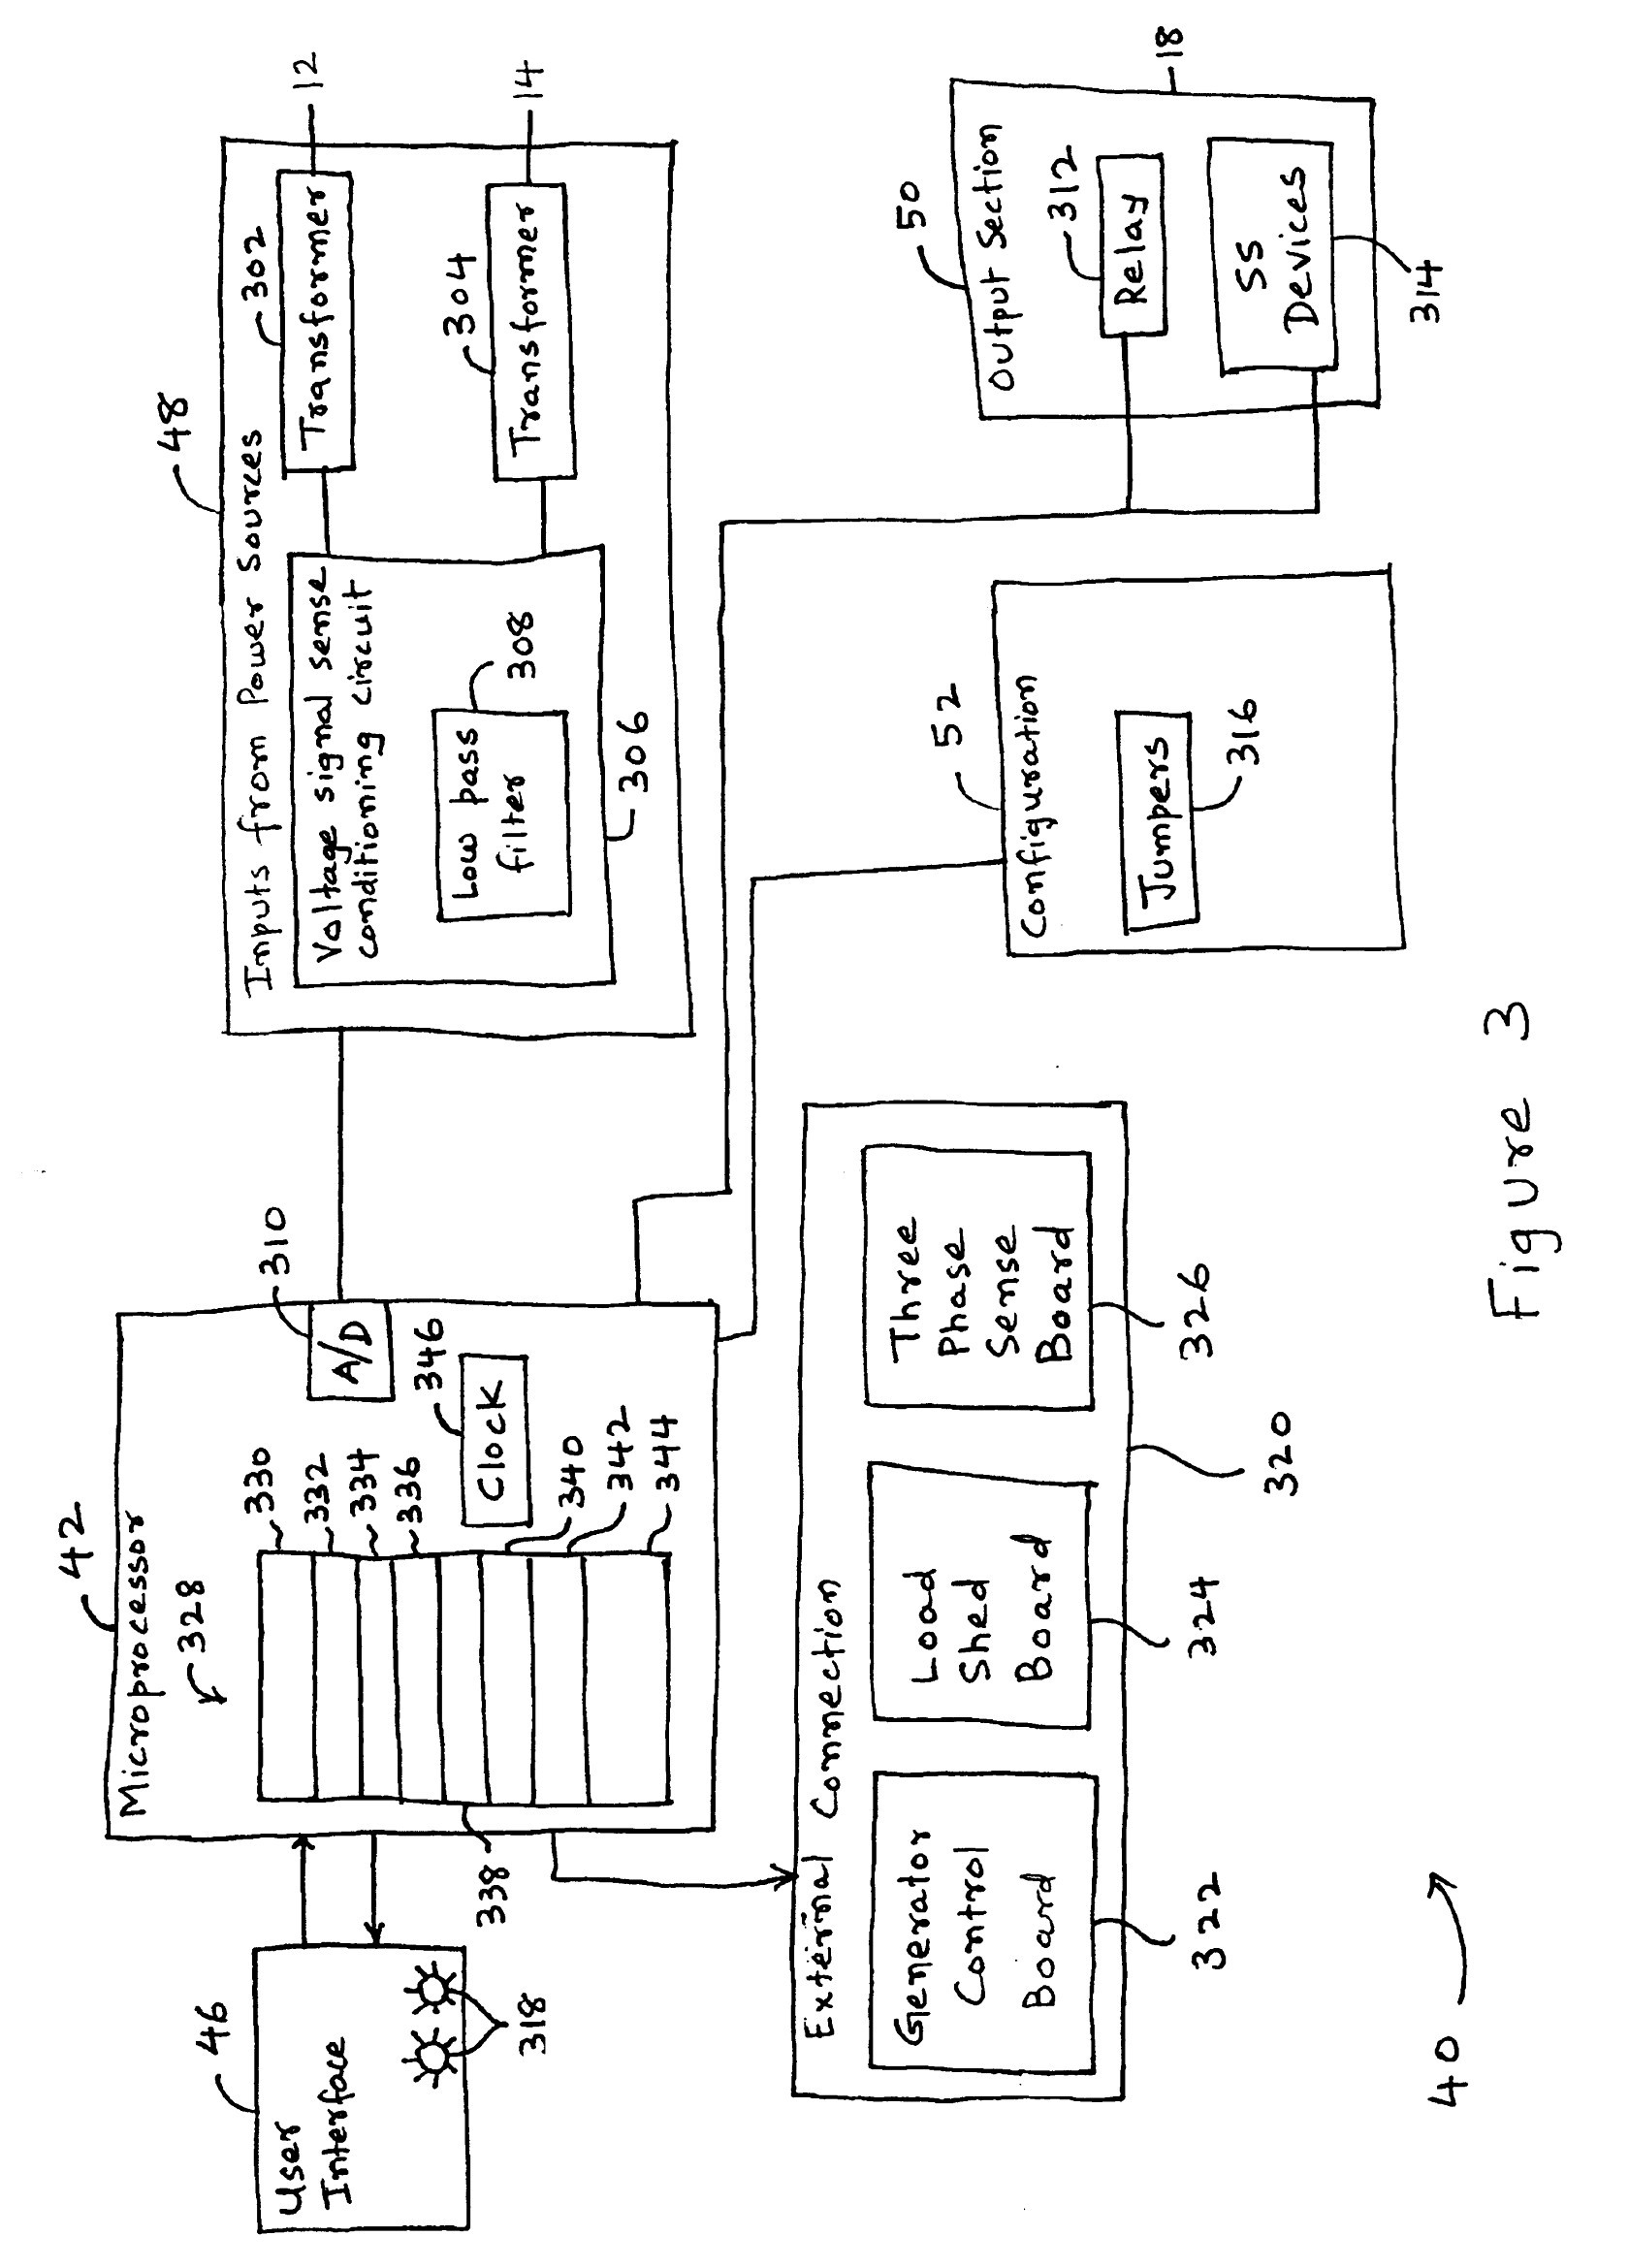 Generac 200 Amp Transfer Switch Wiring Diagram Elegant Generac - 200 Amp Automatic Transfer Switch Wiring Diagram